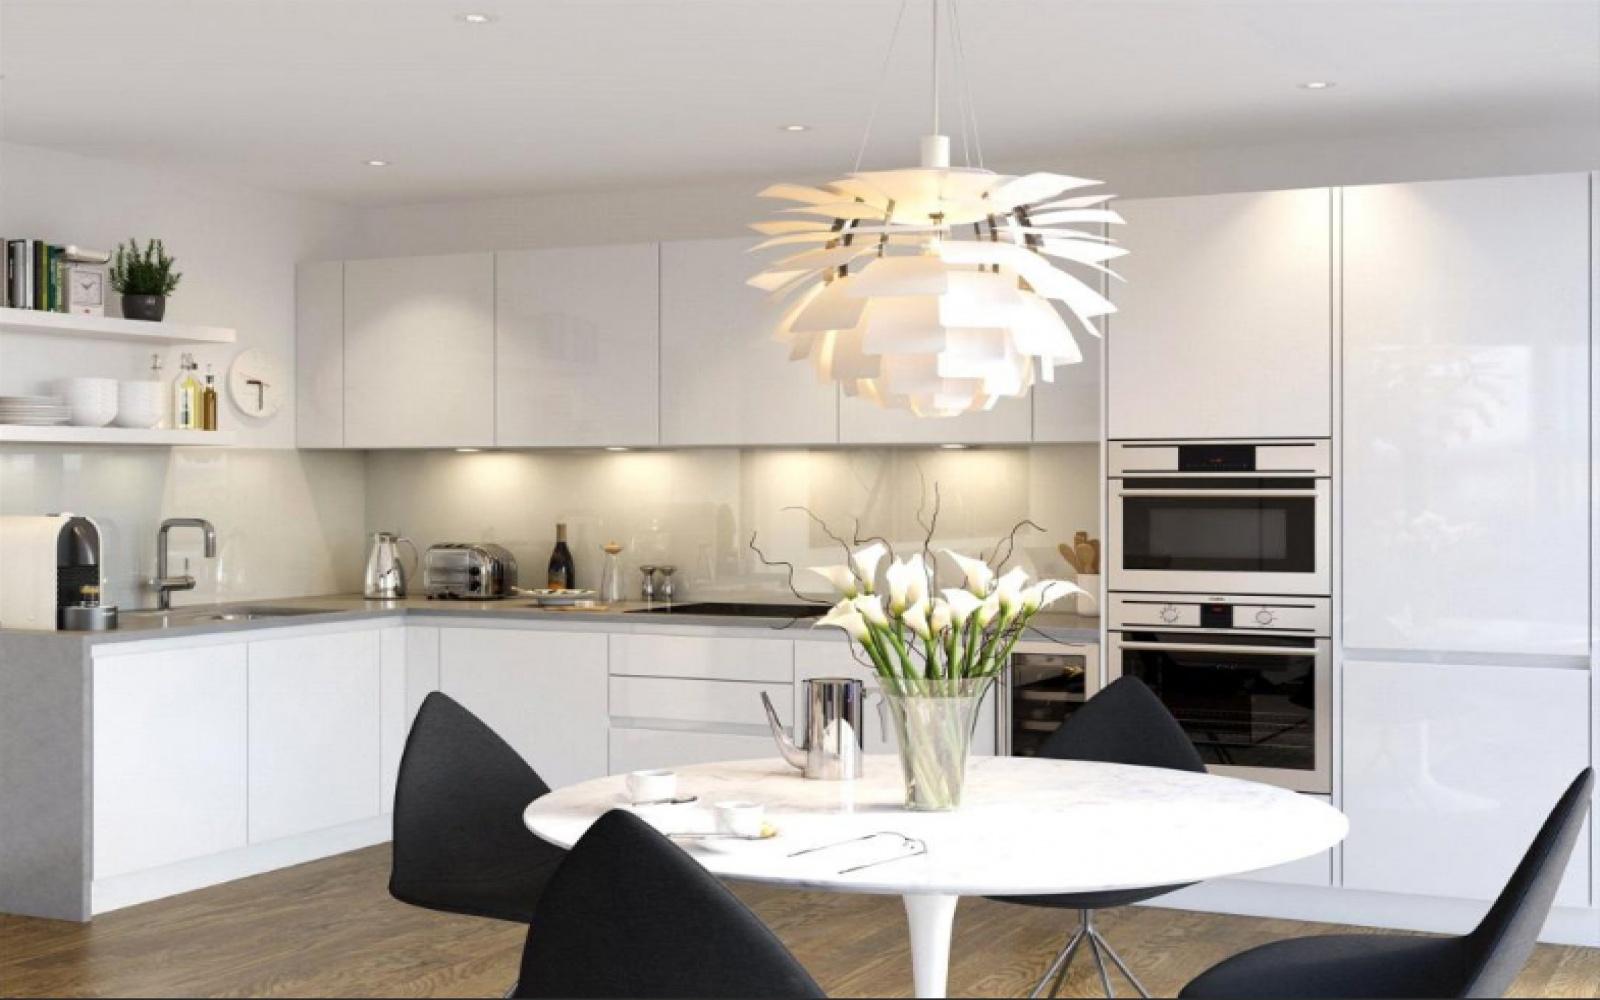 2 Bedrooms, Flat, For Sale, Wandsworth Road, 2 Bathrooms, Listing ID 1042, United Kingdom, Nine Elms,